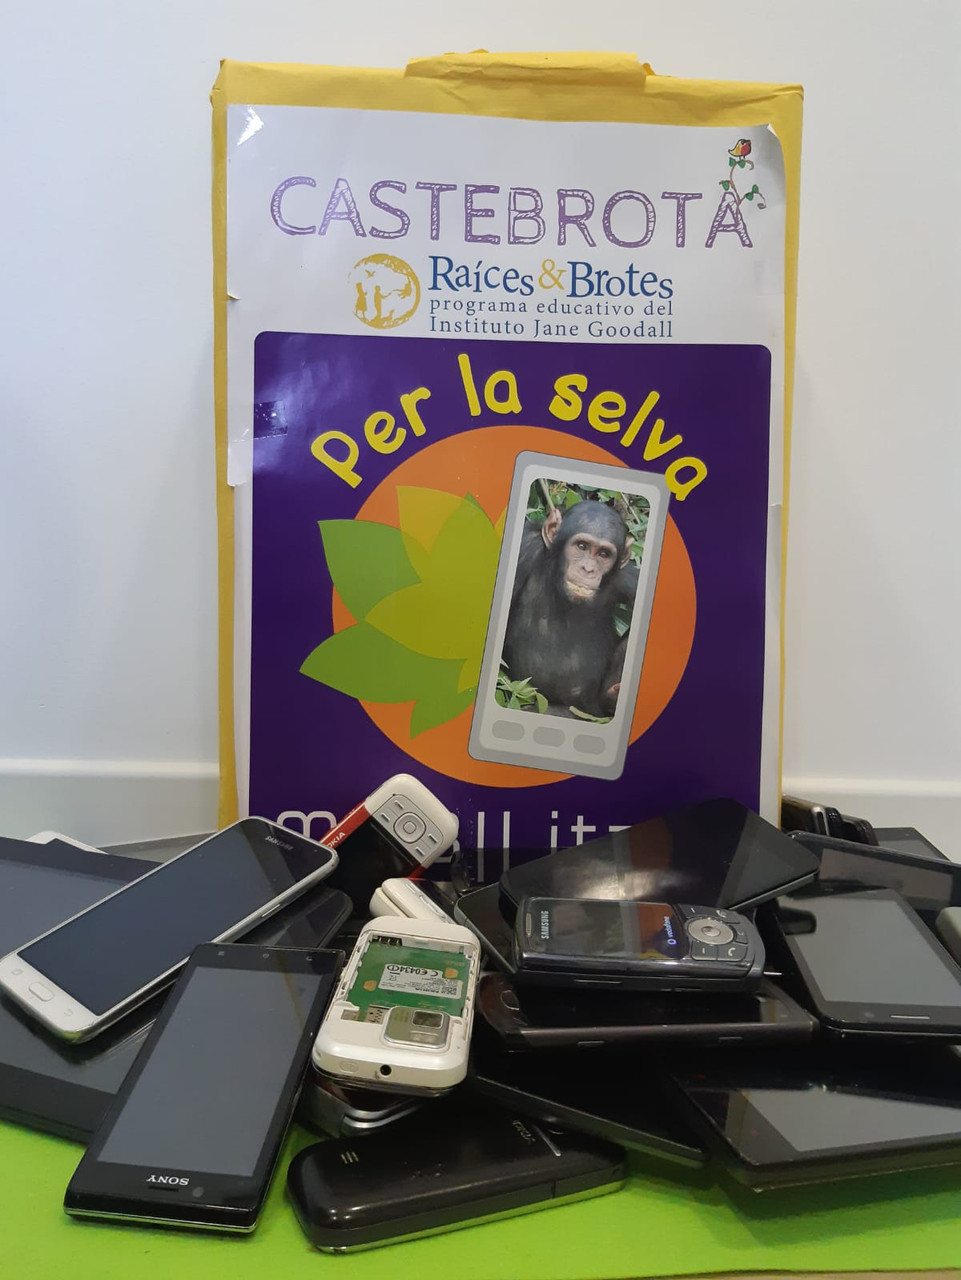 R&B Castebrota y movilizate